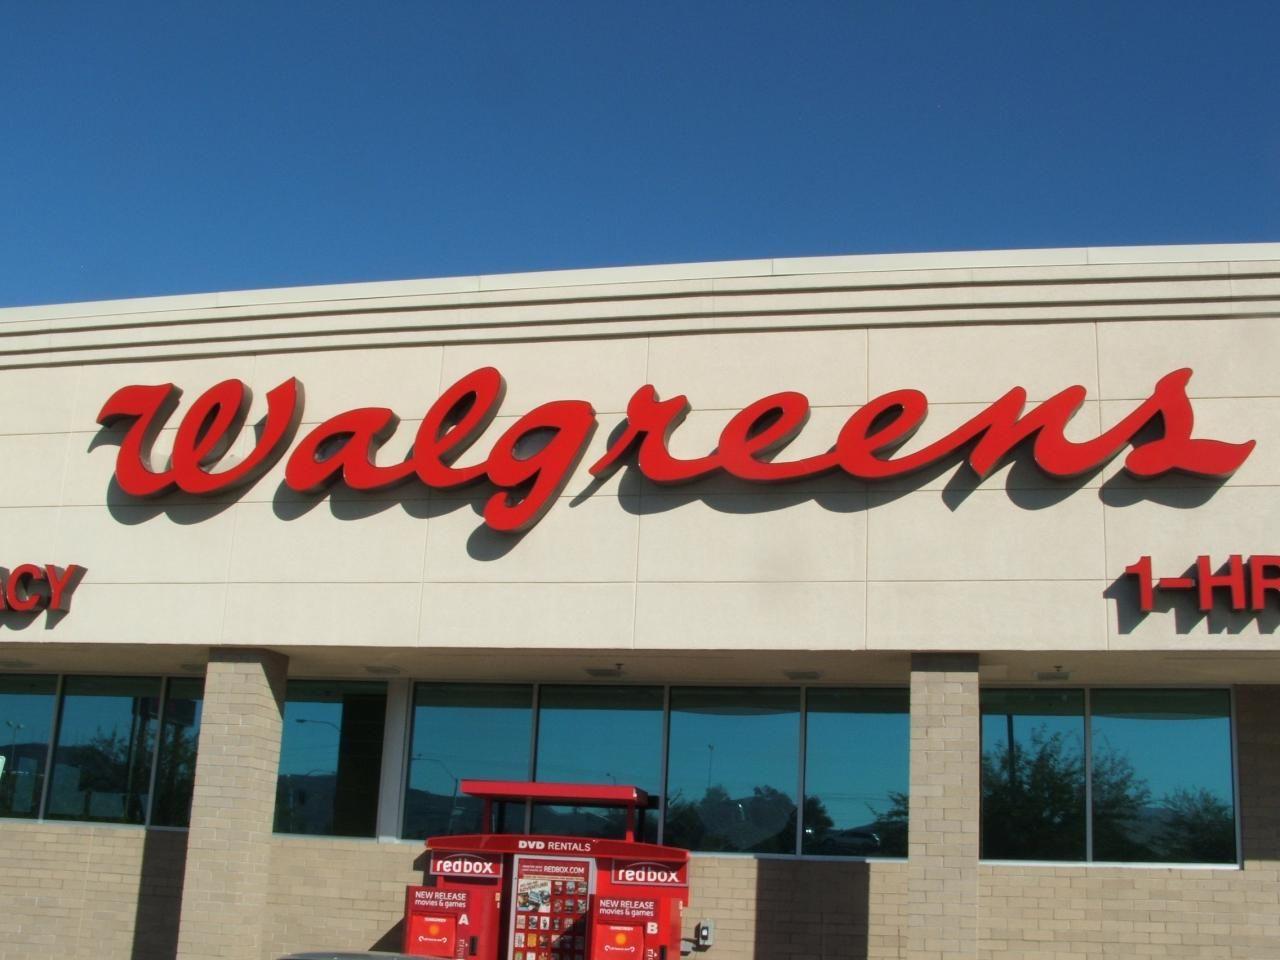 walgreens letter signage - Google Search | Signage | Pinterest | Signage